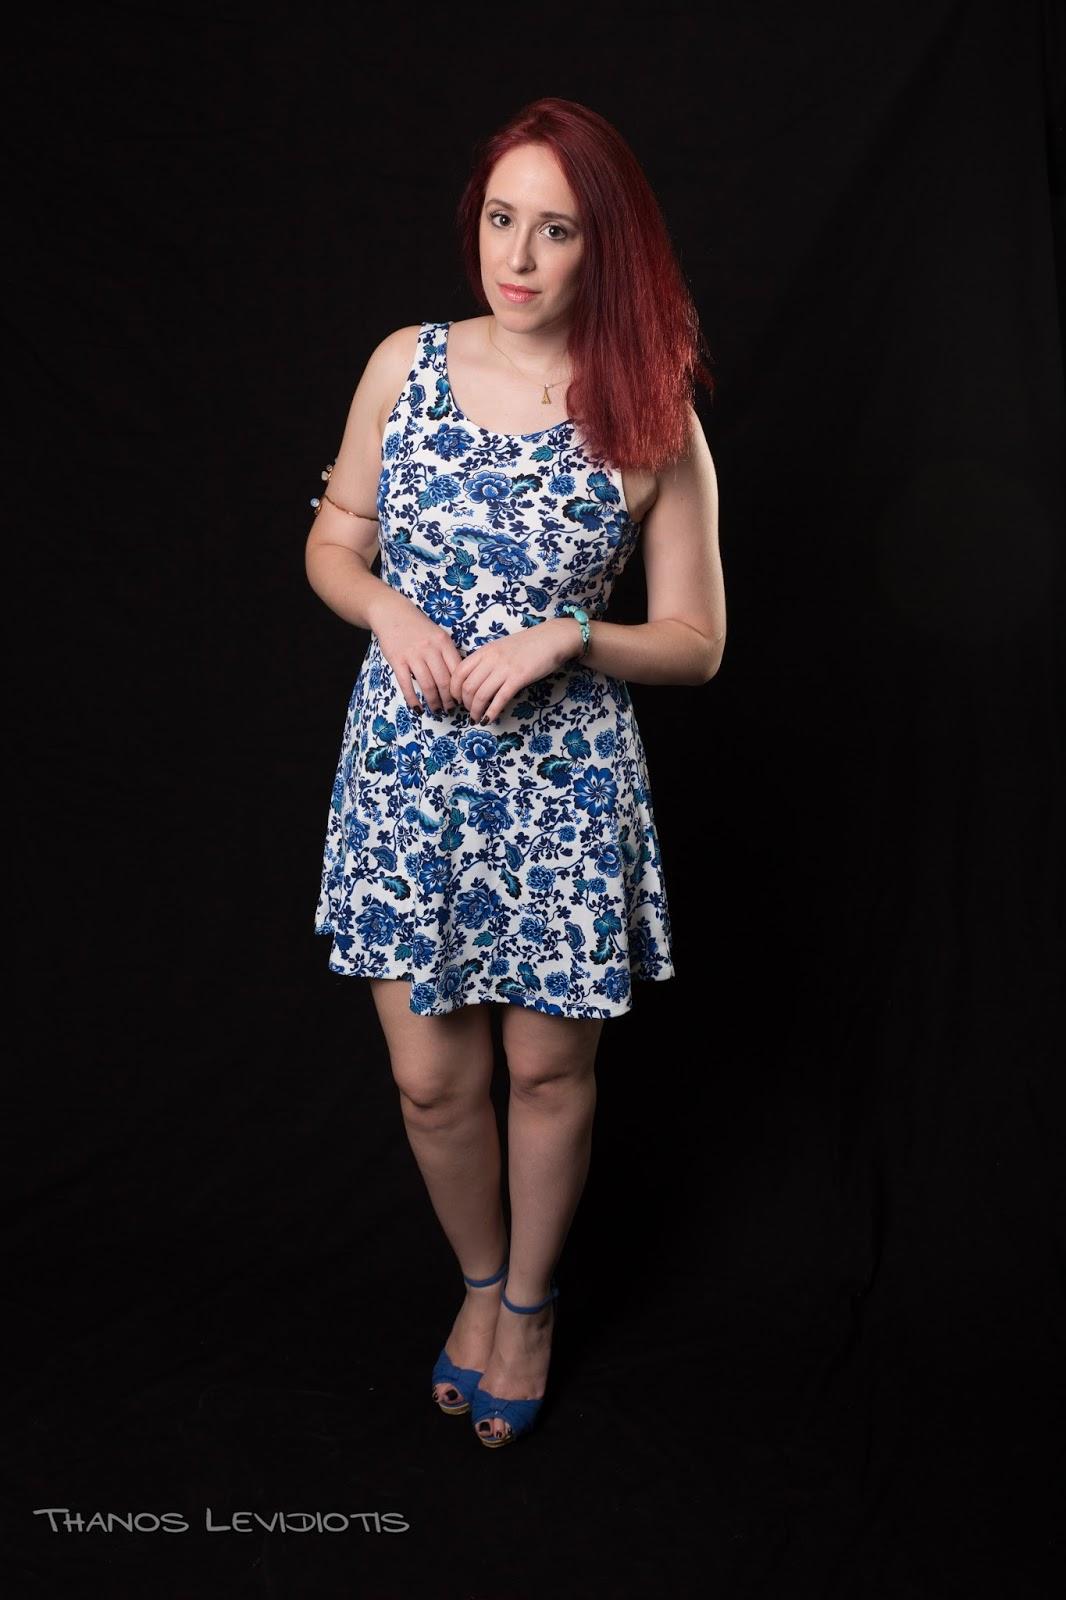 spotlights on the redhead, redhead, model, blogger, review, pretty, anna keni, anna,2016,trends,H&M,dress, floral, blue dress, white dress, mini, legs, high heels